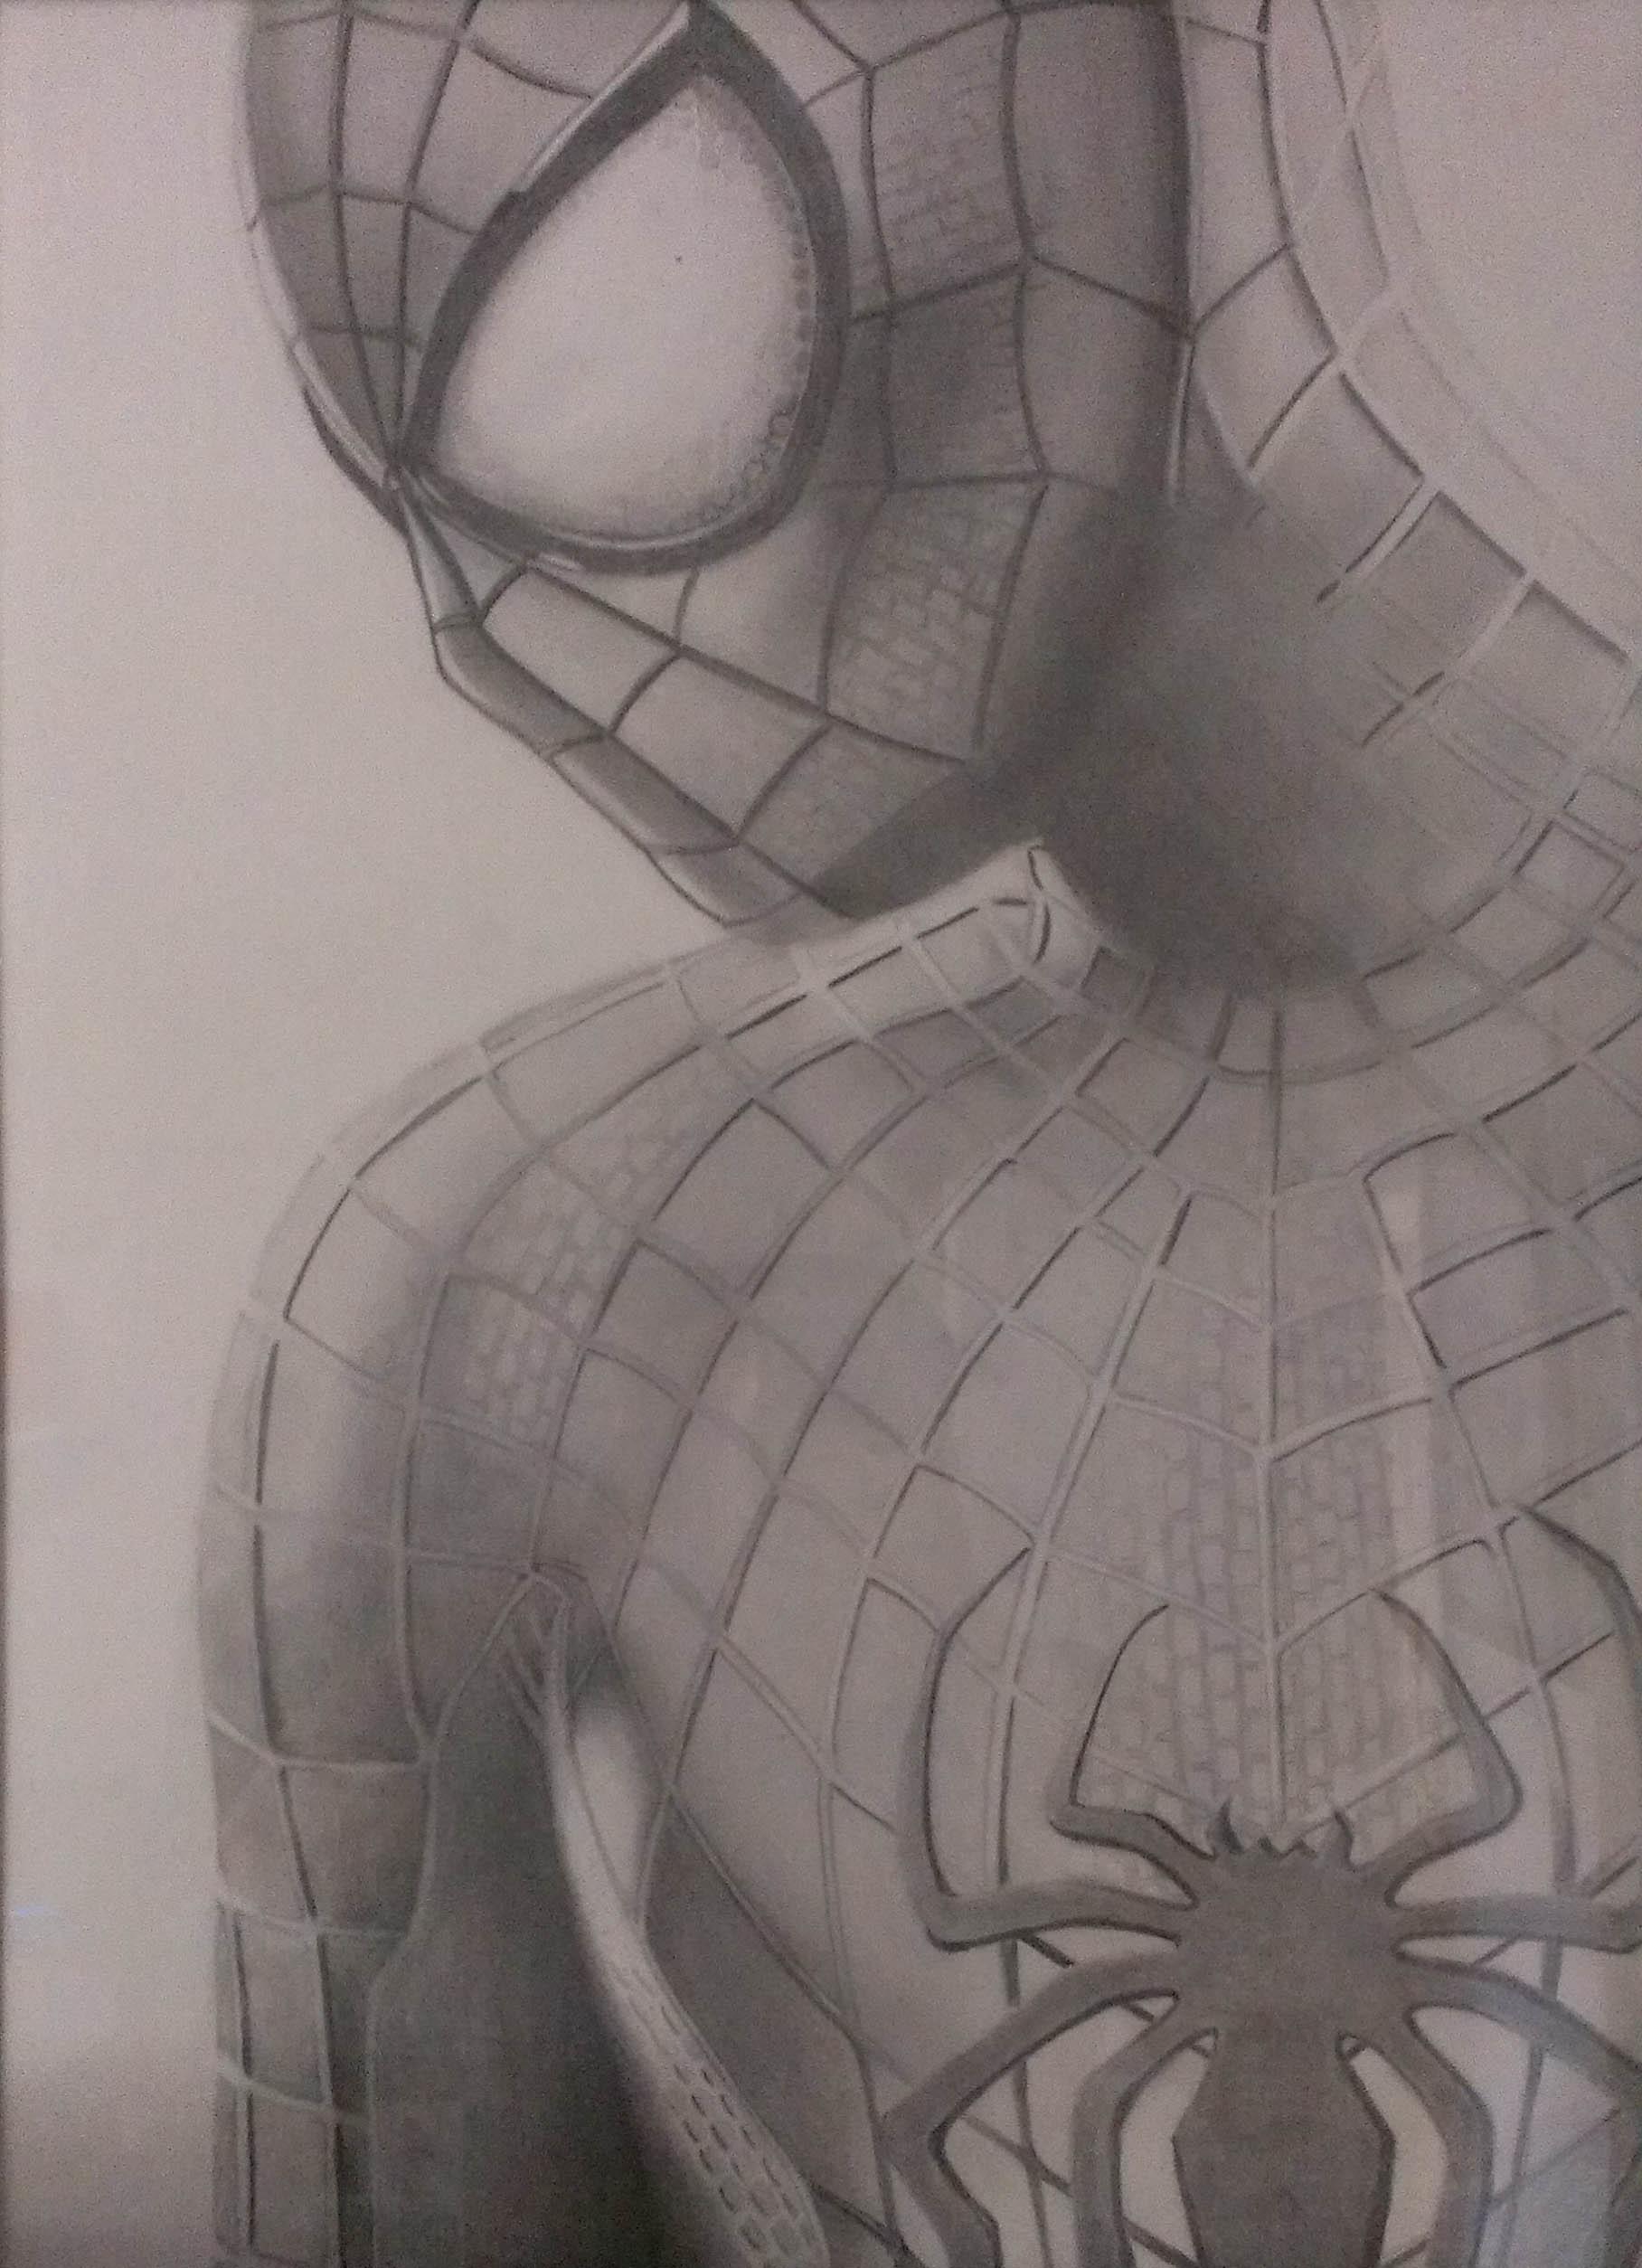 1816x2508 World's Best Pencil Sketch Of Spiderman Amazing Spiderman 2